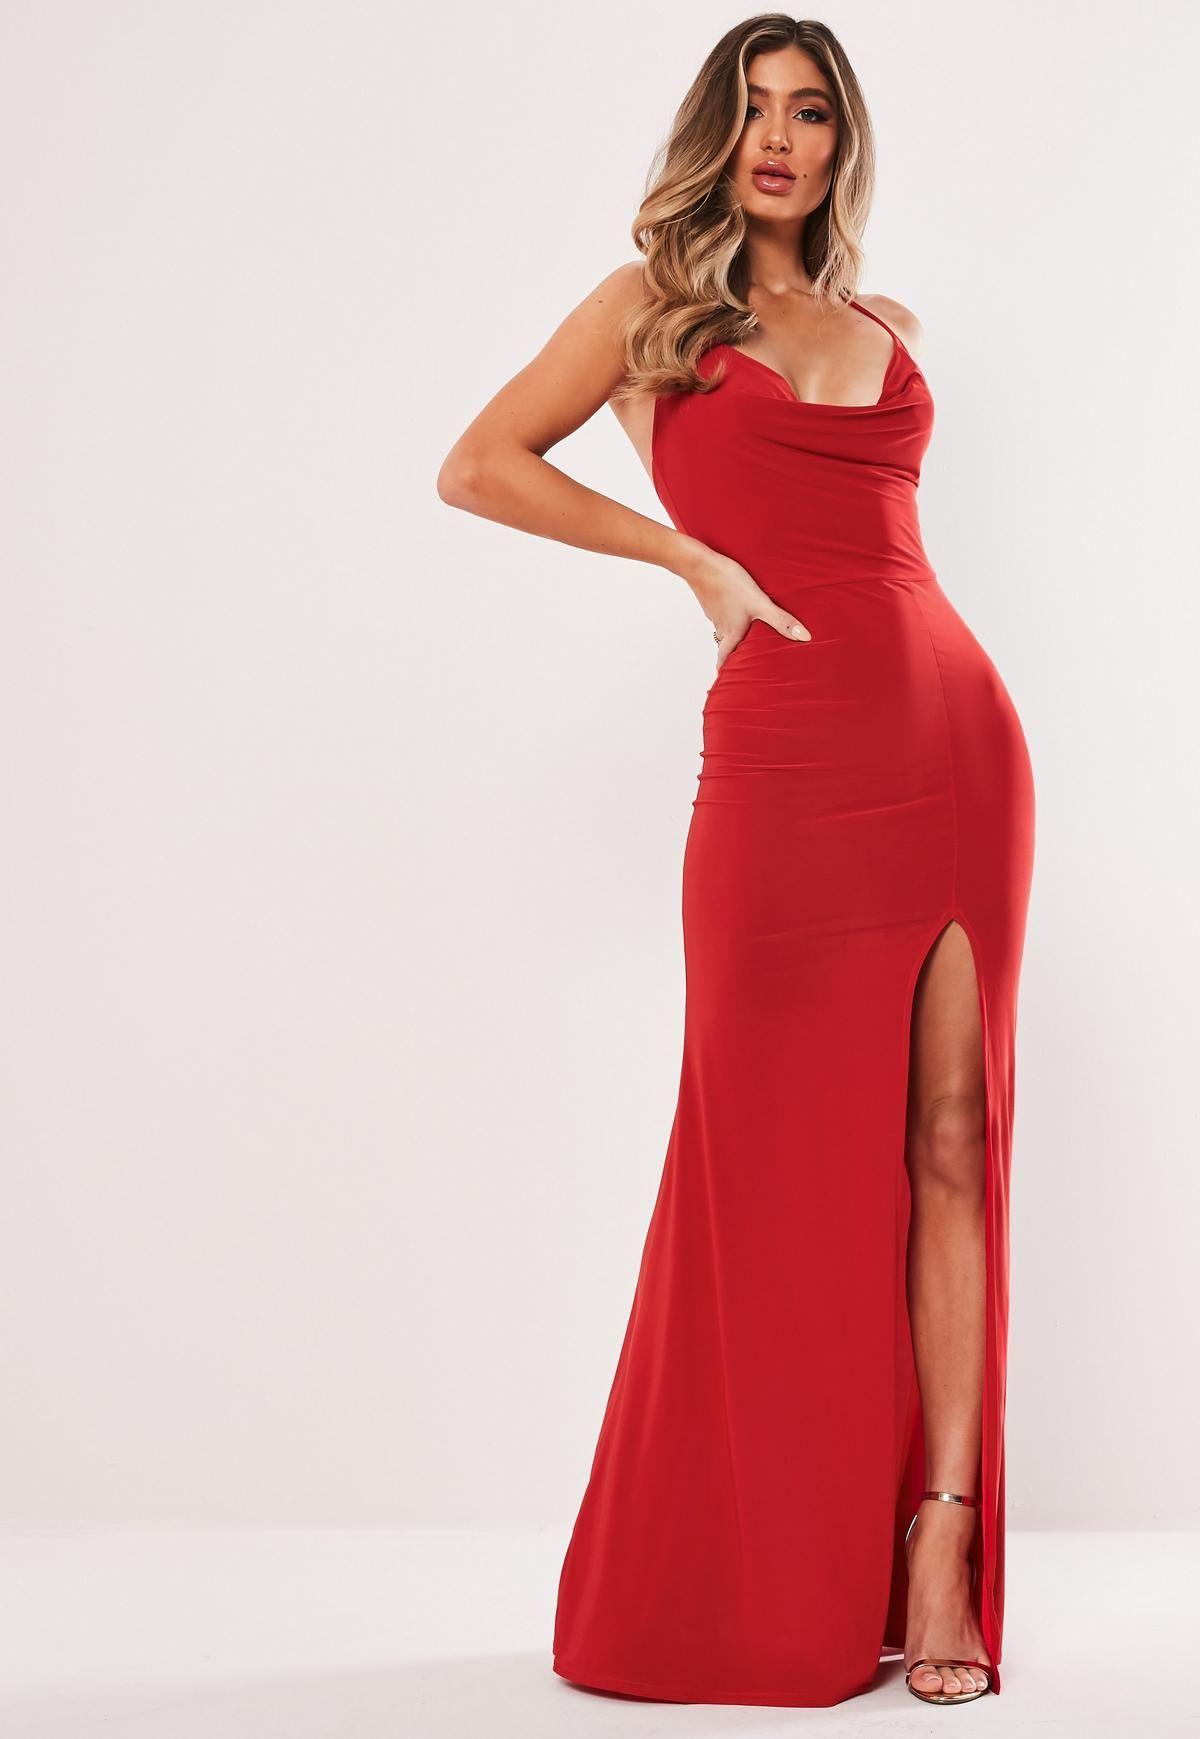 Red Slinky Cowl Neck Split Detail Maxi Dress Missguided Bodycon Maxi Dresses Red Bodycon Dress Dresses